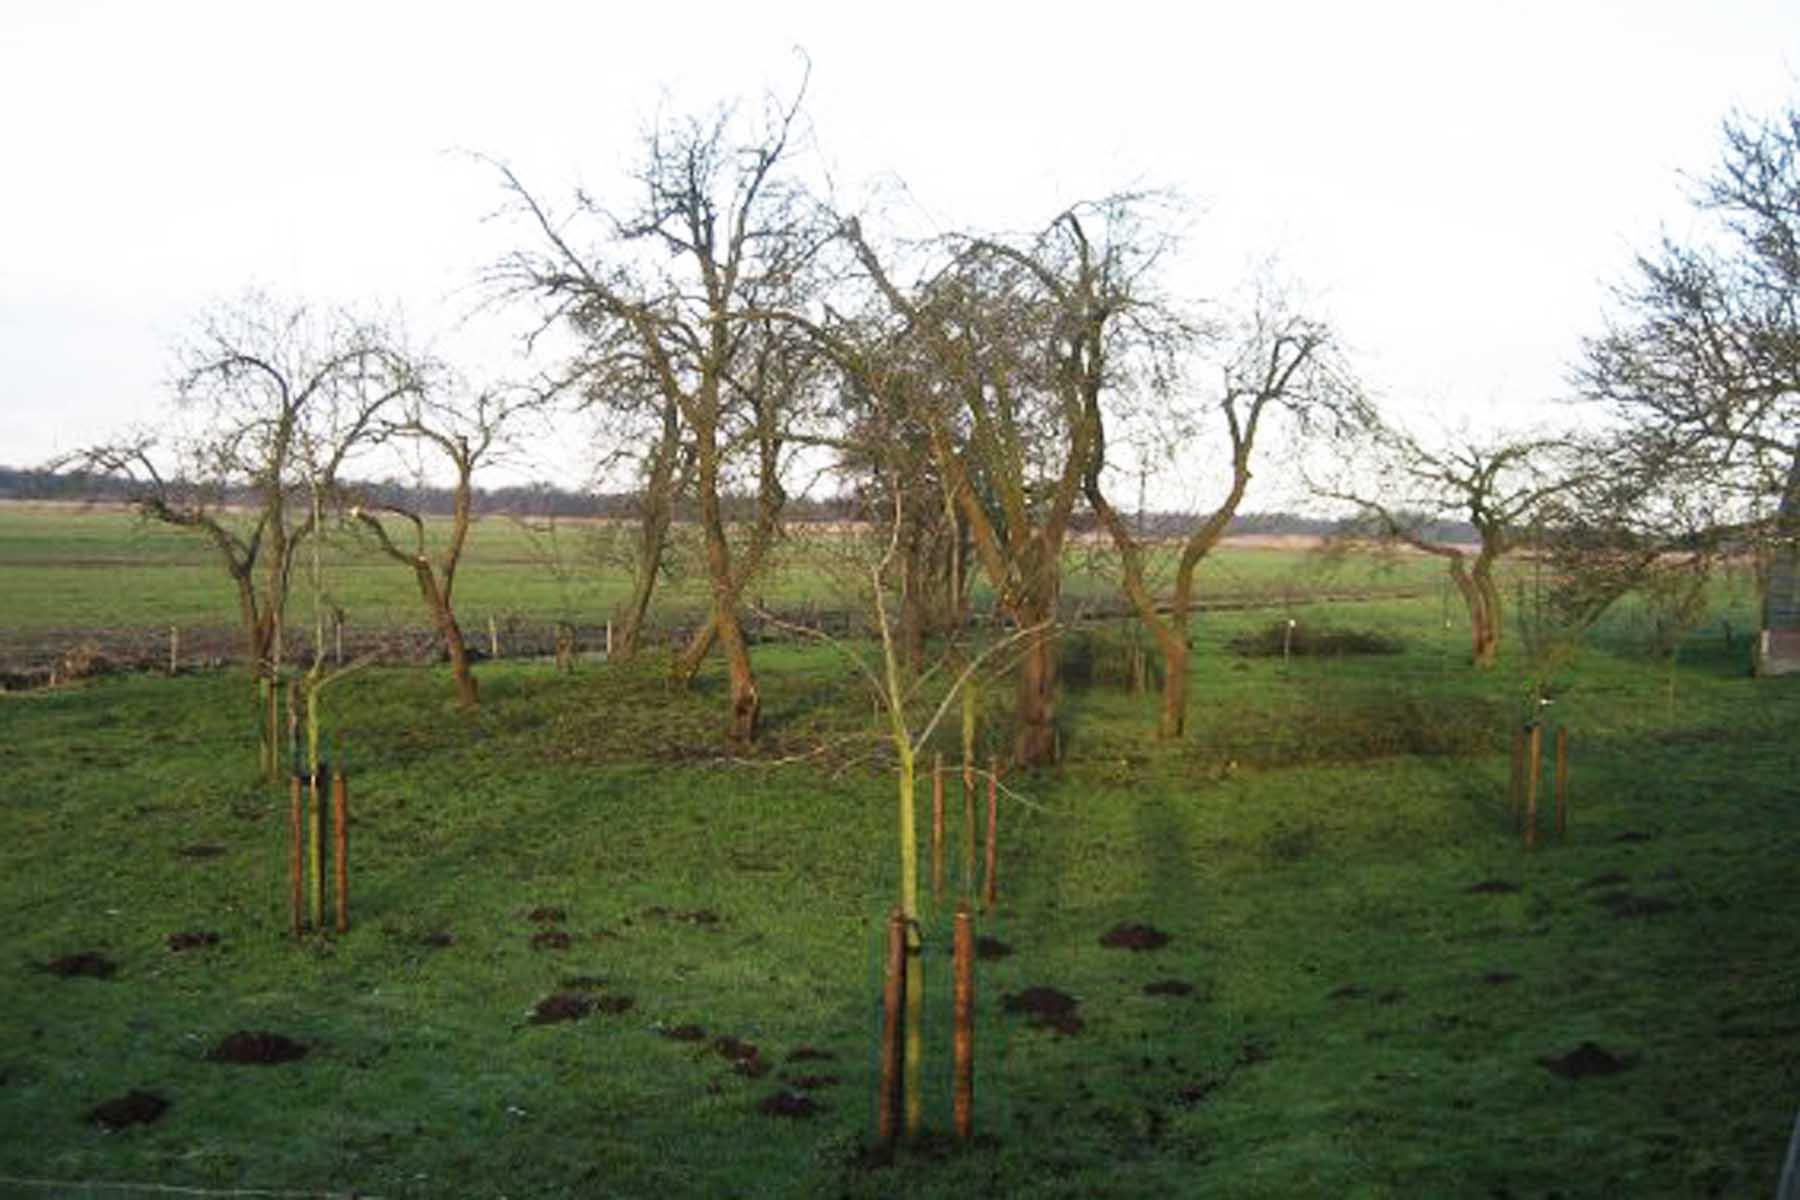 2011-01-08-hbs-te-wanneperveen-4